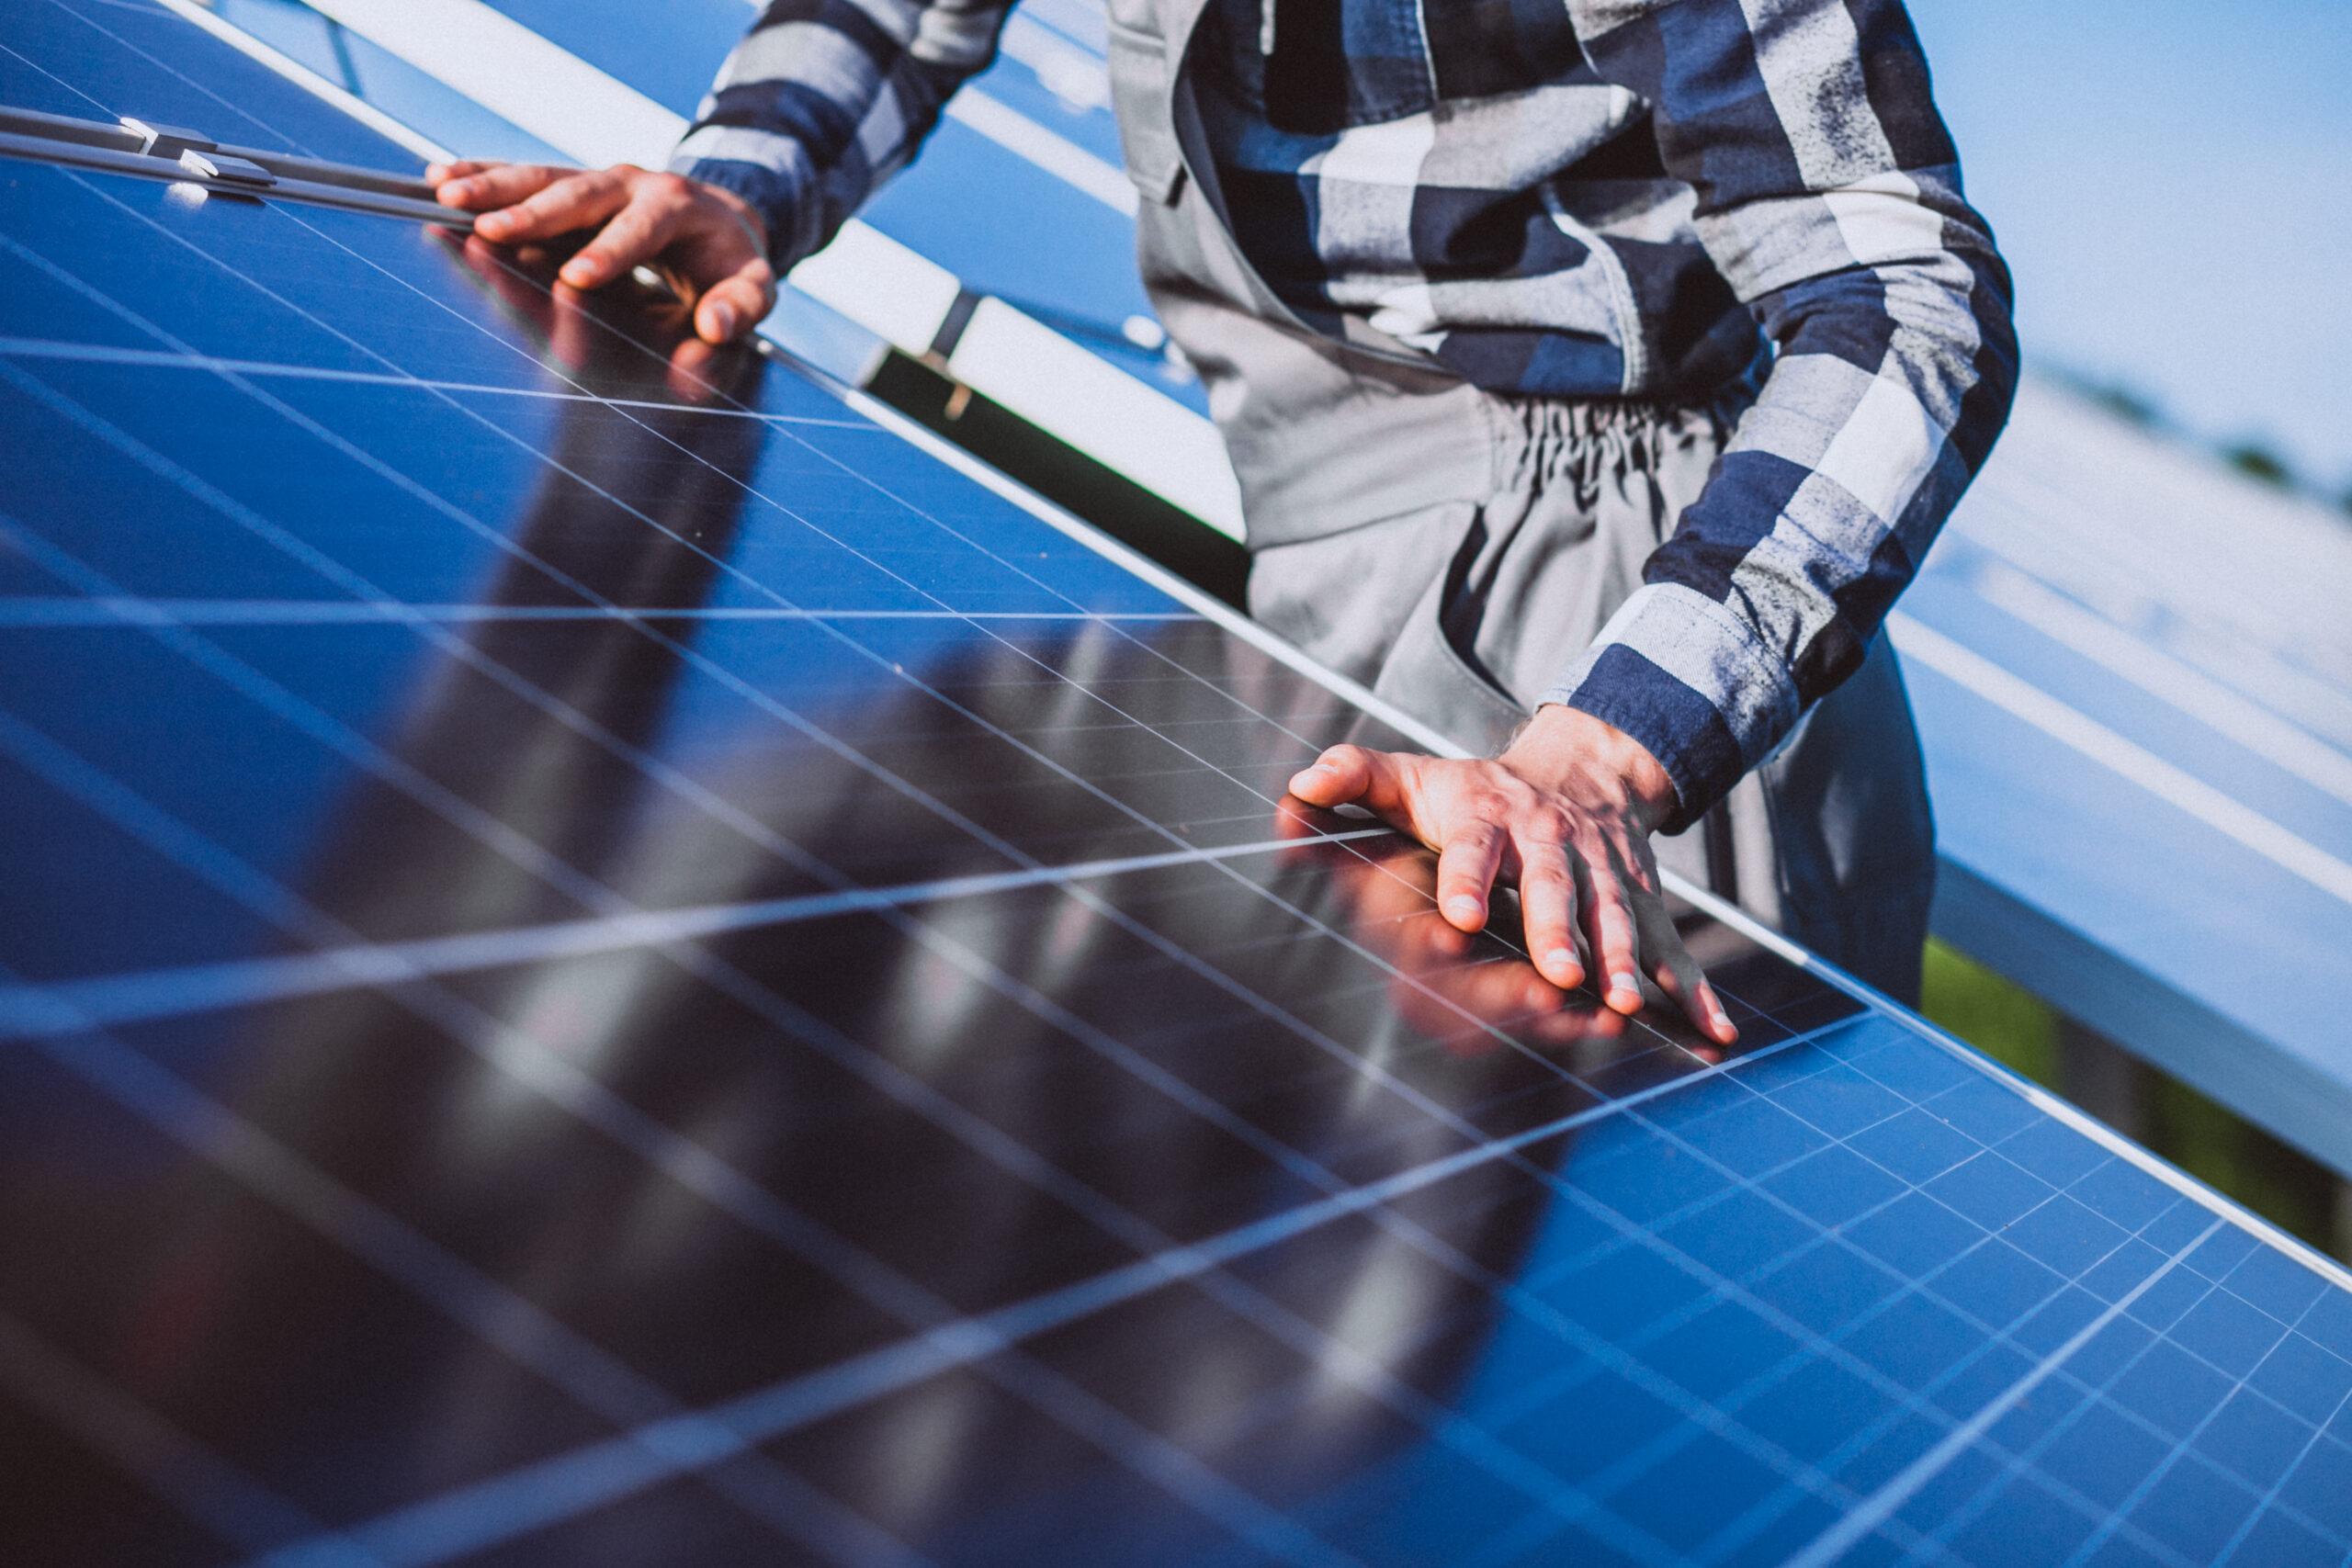 Quer se tornar instalador de energia solar? SAIBA COMO